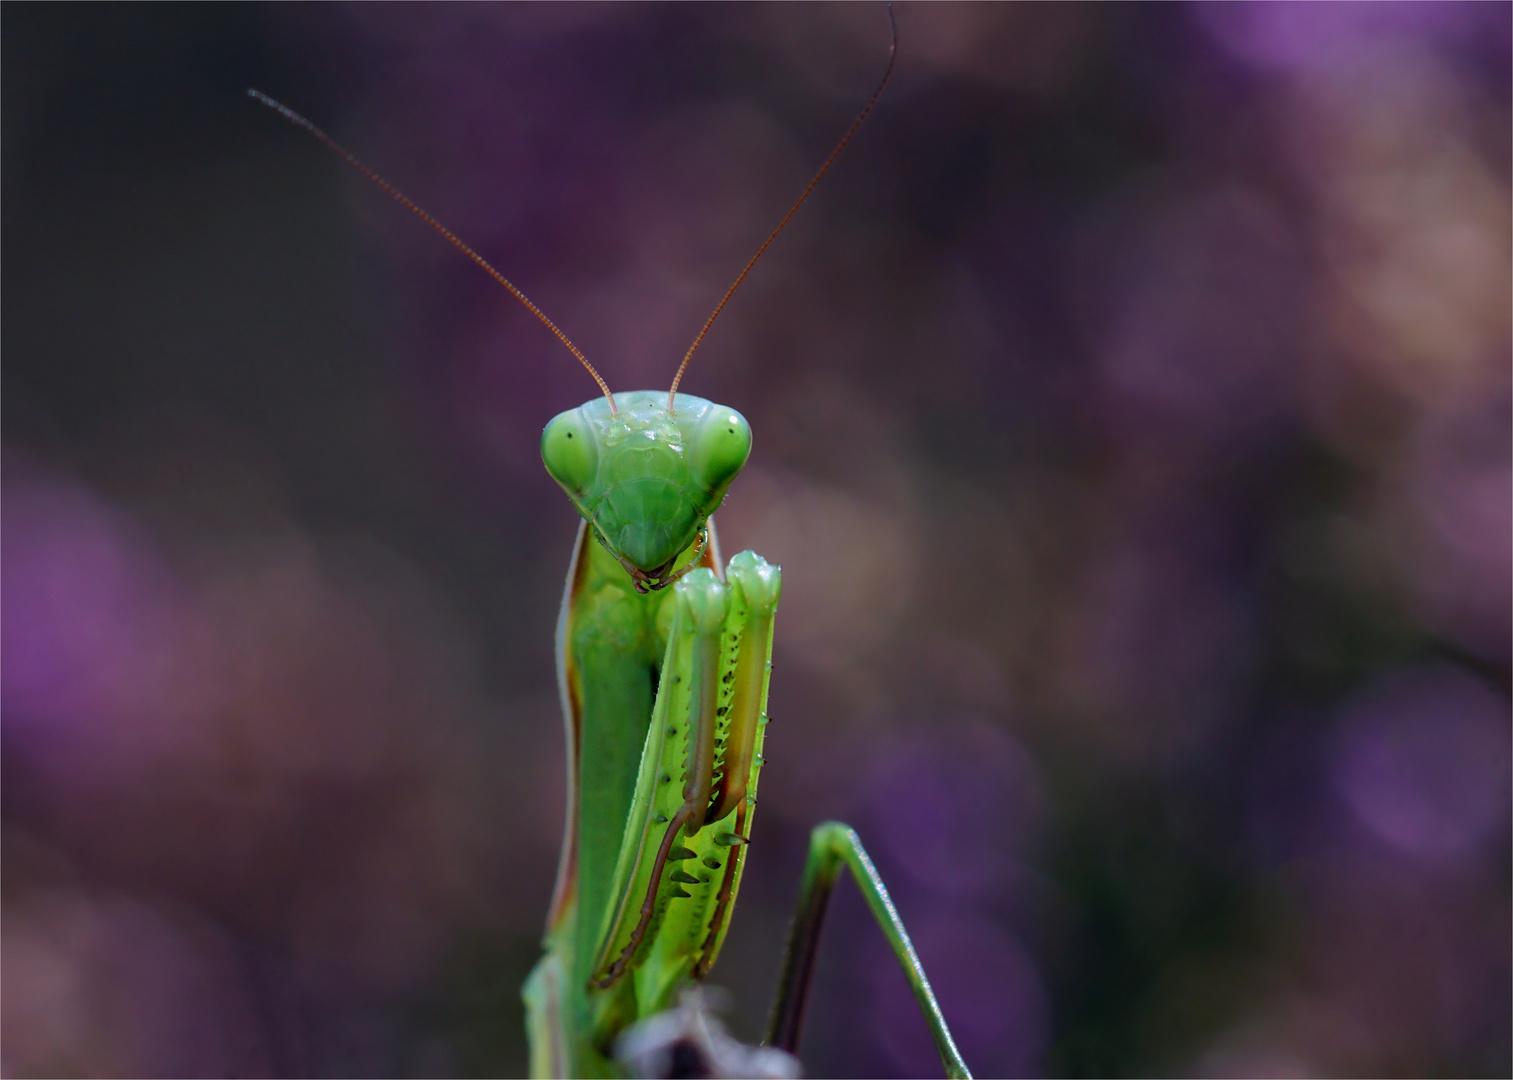 """Heidealien"" - Gottesanbeterin, Mantis religiosa"